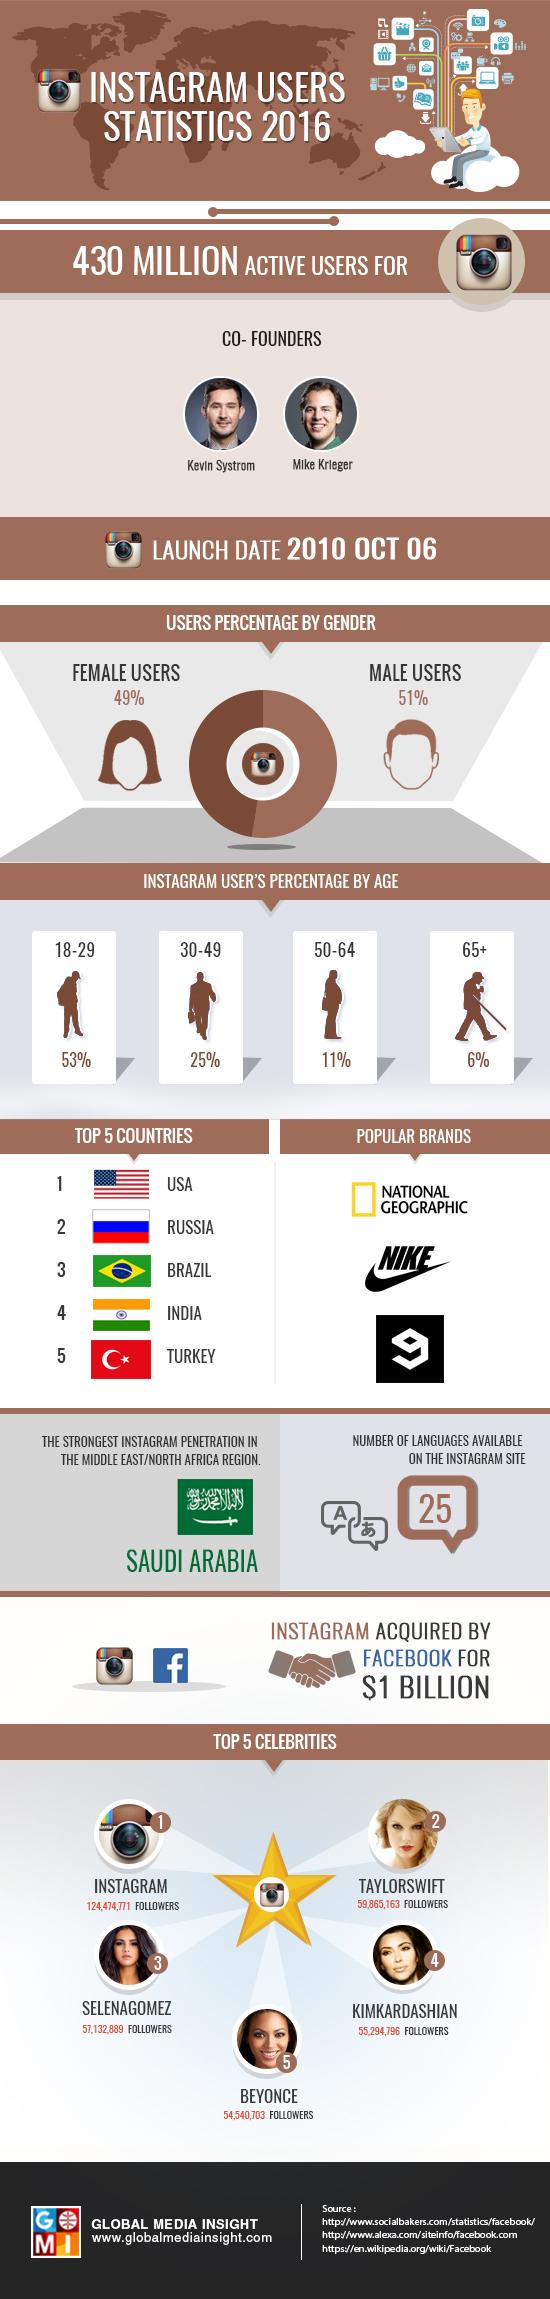 instagram-users-statistics-2016